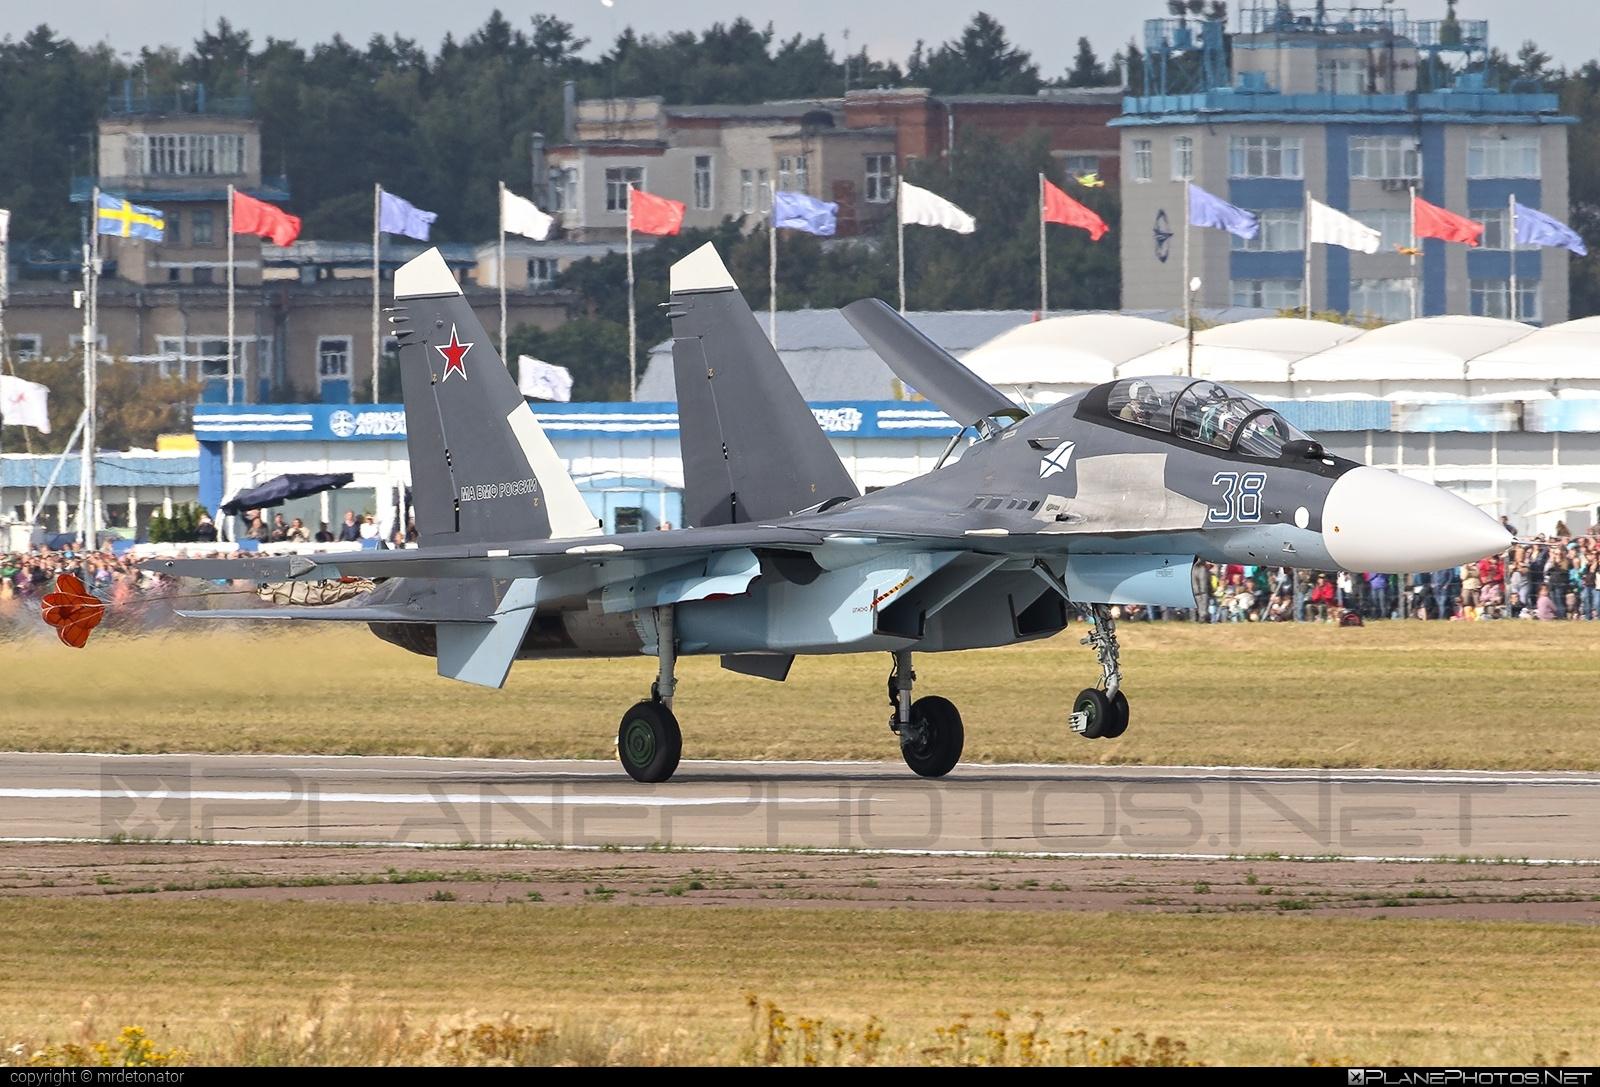 Sukhoi Su-30SM - 38 operated by Voyenno-vozdushnye sily Rossii (Russian Air Force) #sukhoi